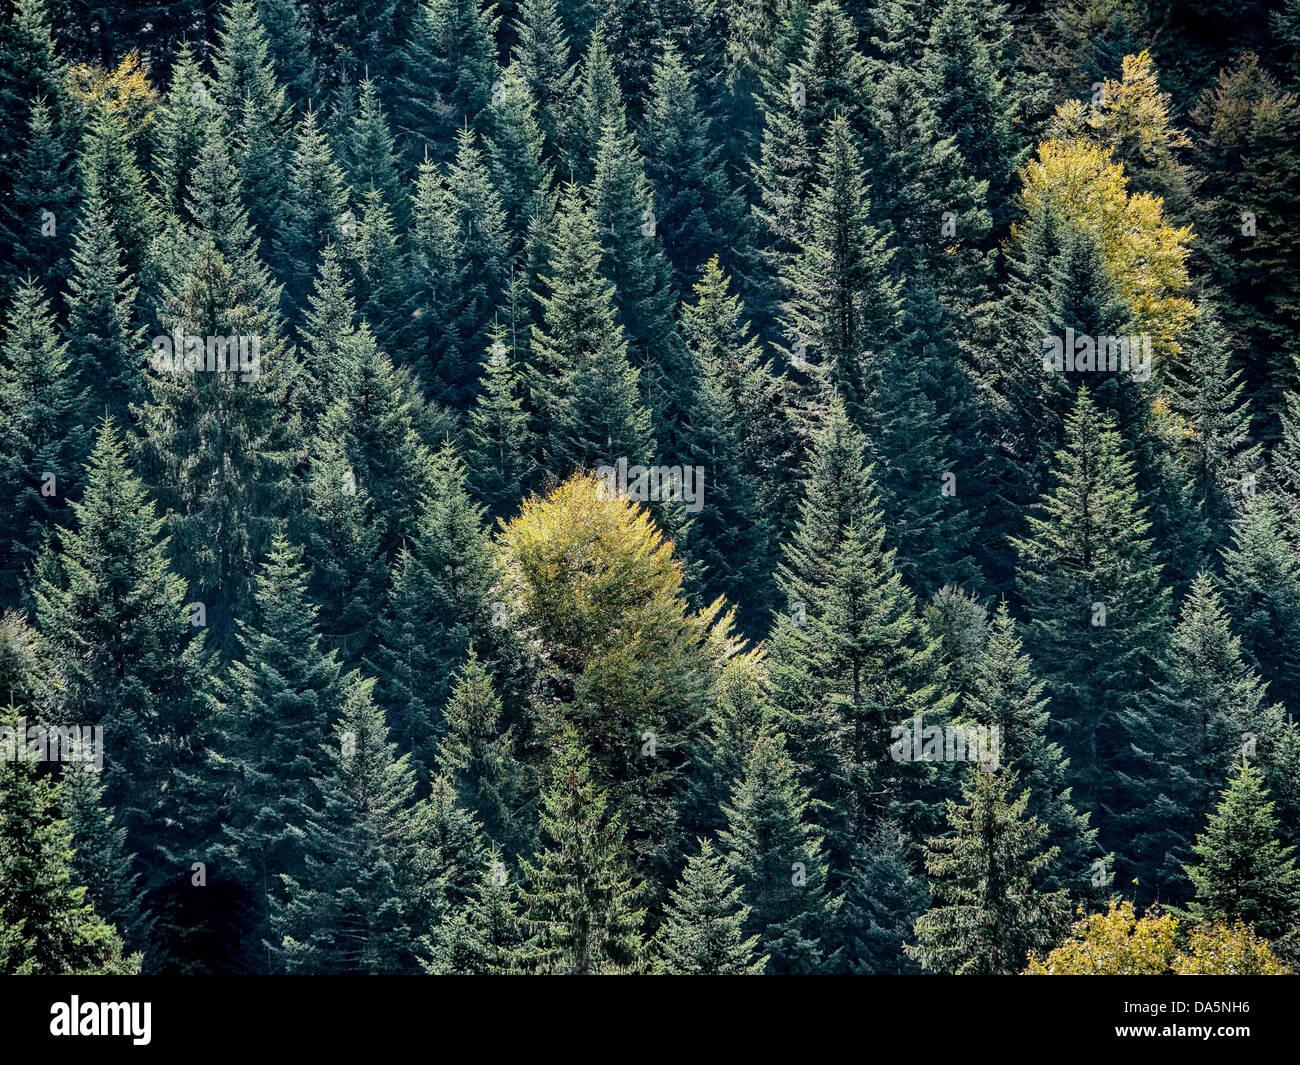 To book, beech, Emmental, spruce forest, Yellow, autumn, canton Bern, Bern, Langnau, Lüderenalp, Switzerland, - Stock Image